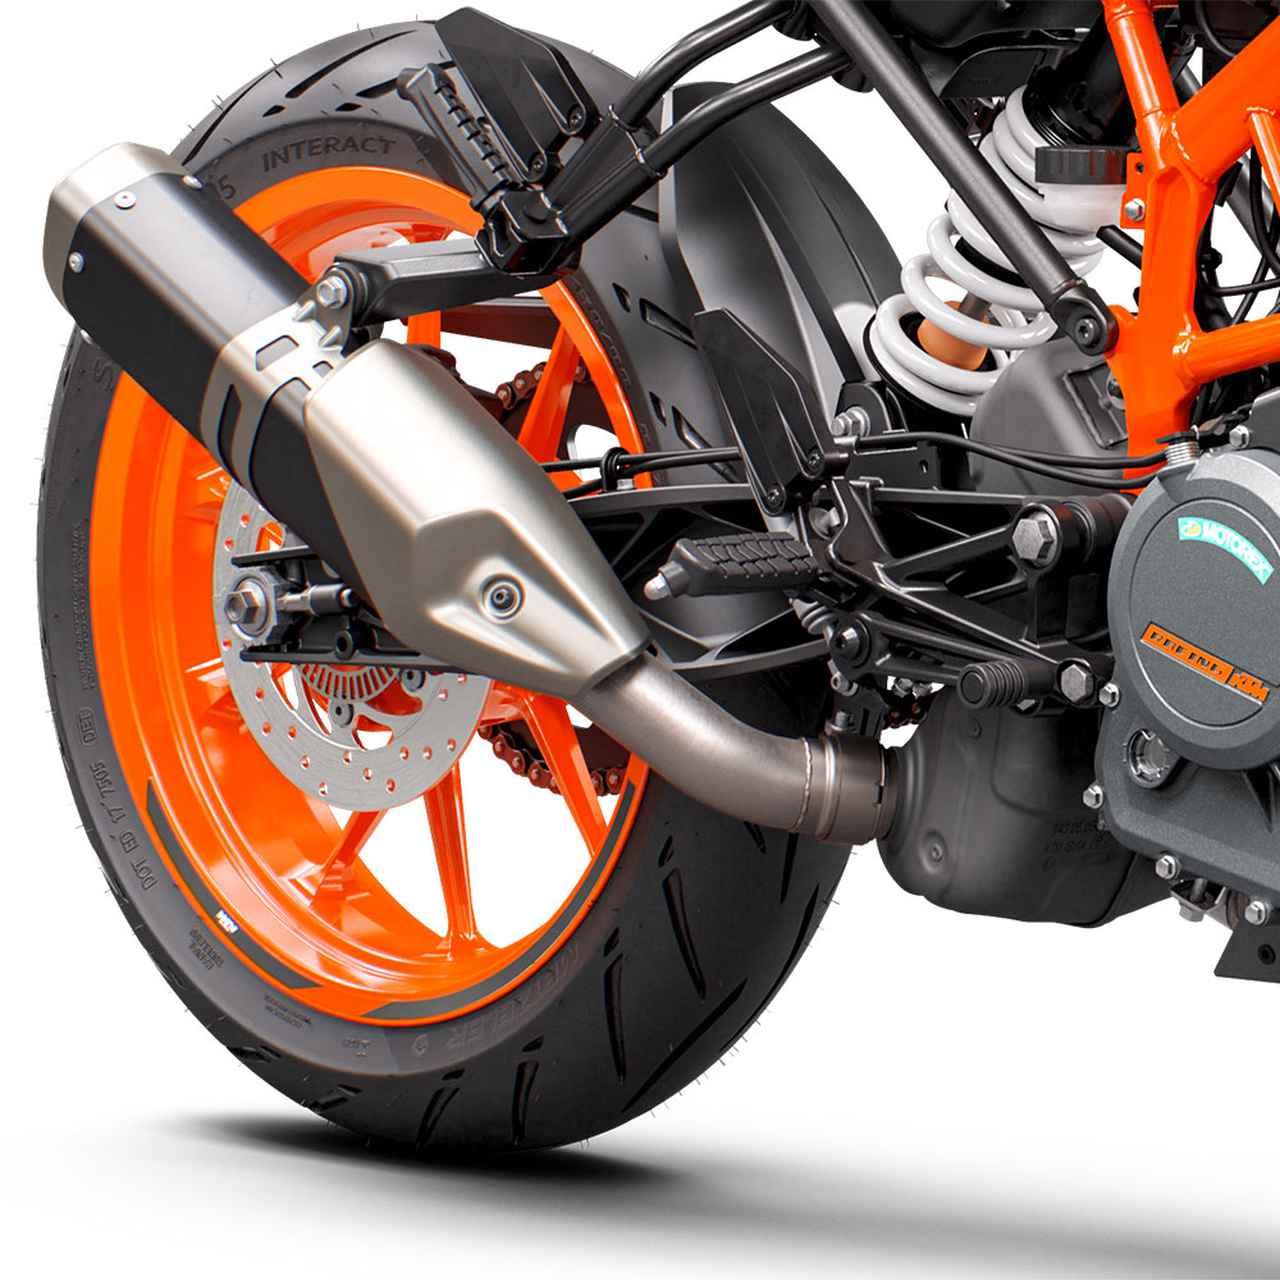 Images : 13番目の画像 - 【写真20枚】KTM「250 デューク」 - webオートバイ